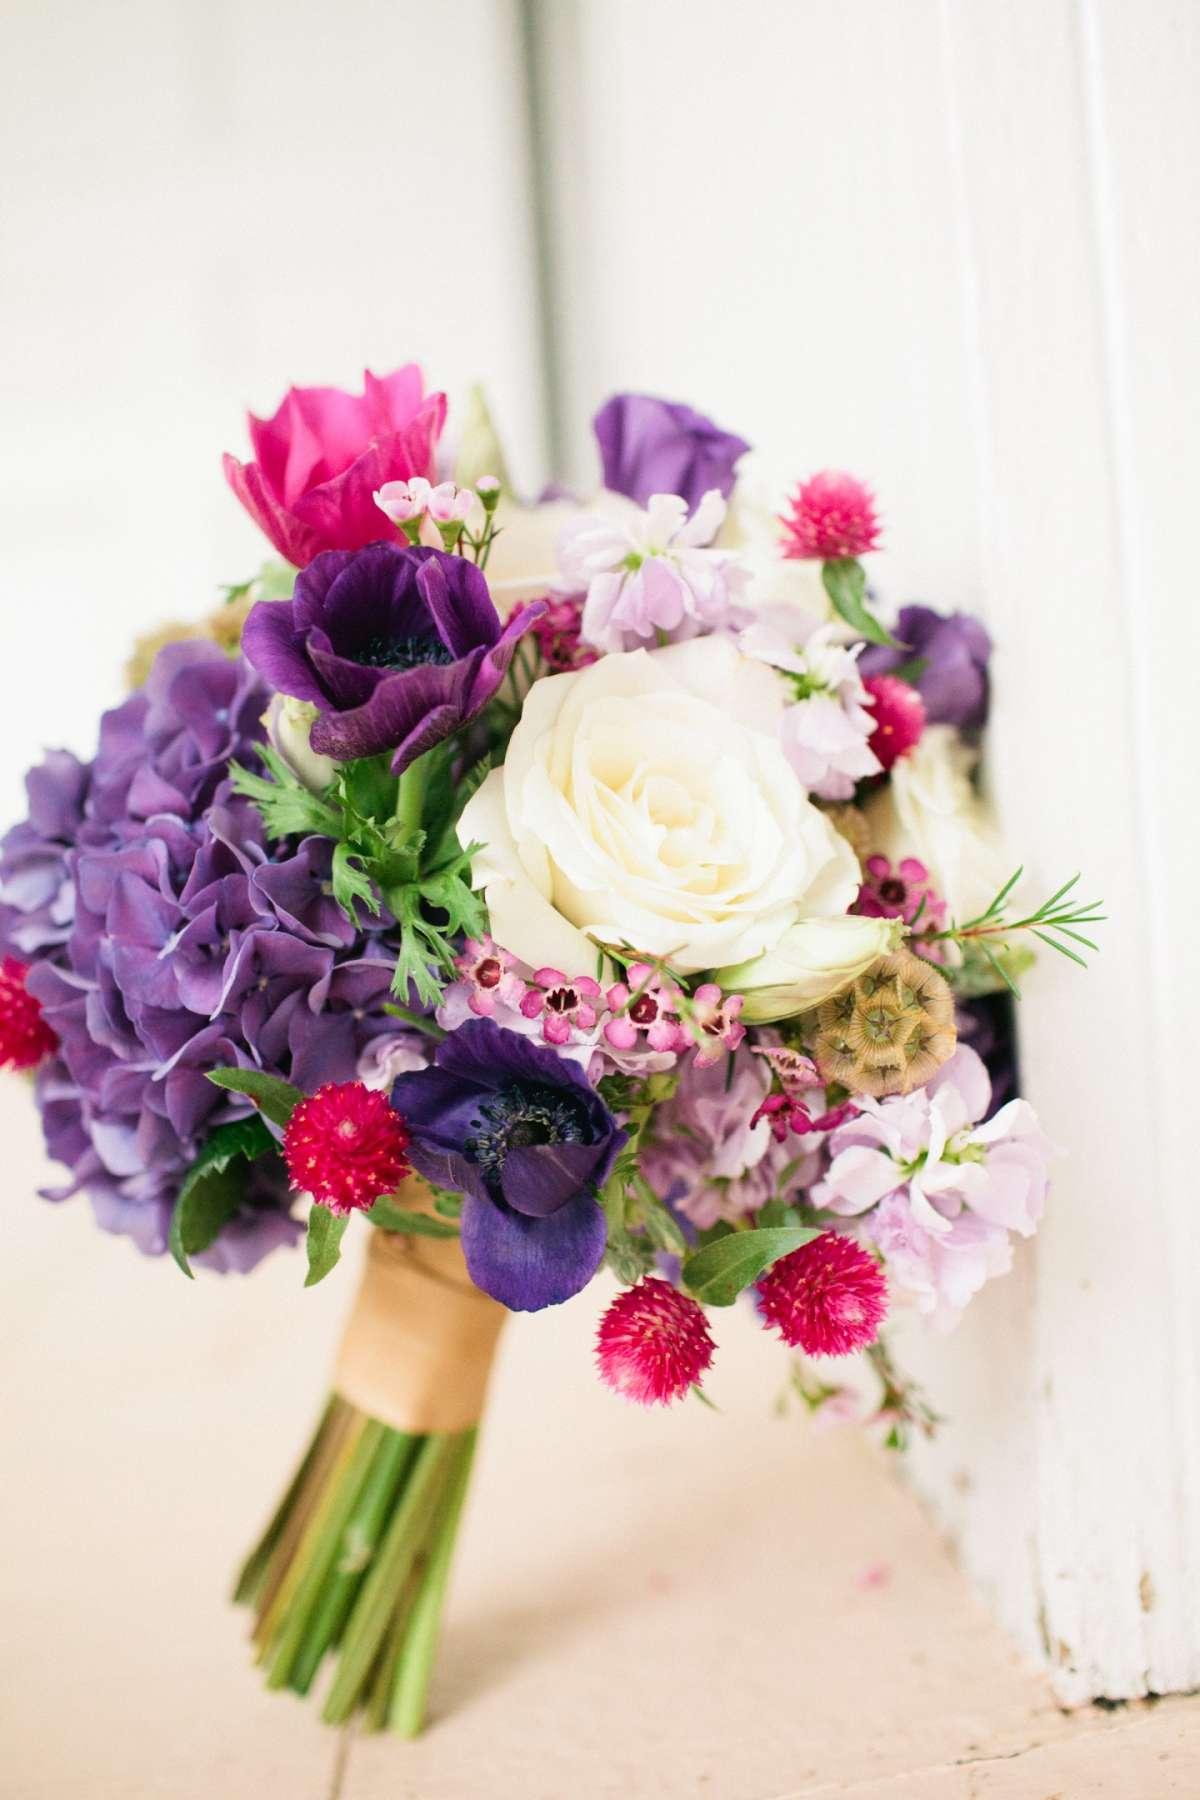 Bouquet sposa estivi b71f59beca0